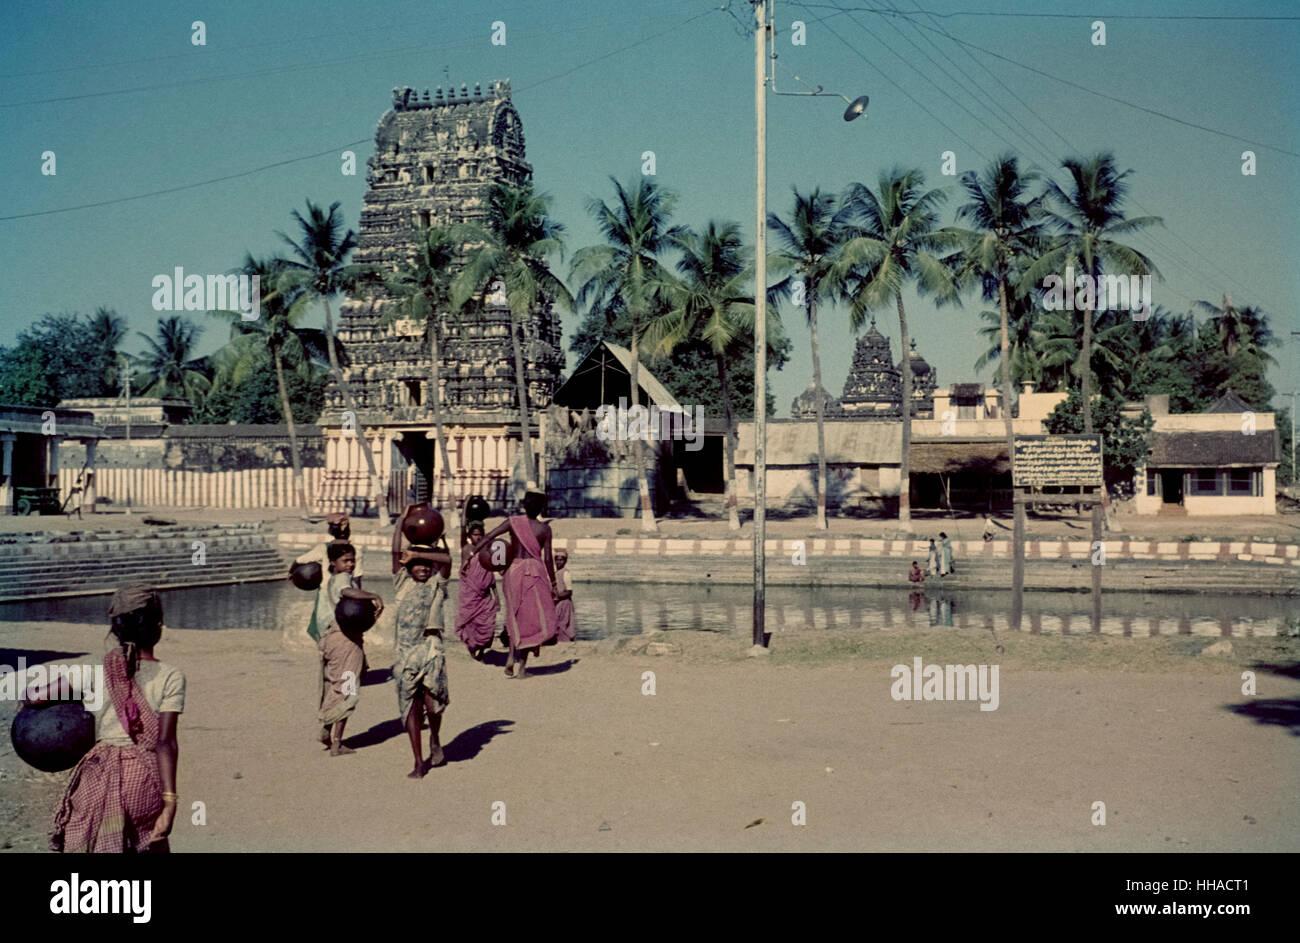 Wasserträgerinnen in Tamil Nadu 1962. Water carrier in front of a gopura in India Stock Photo